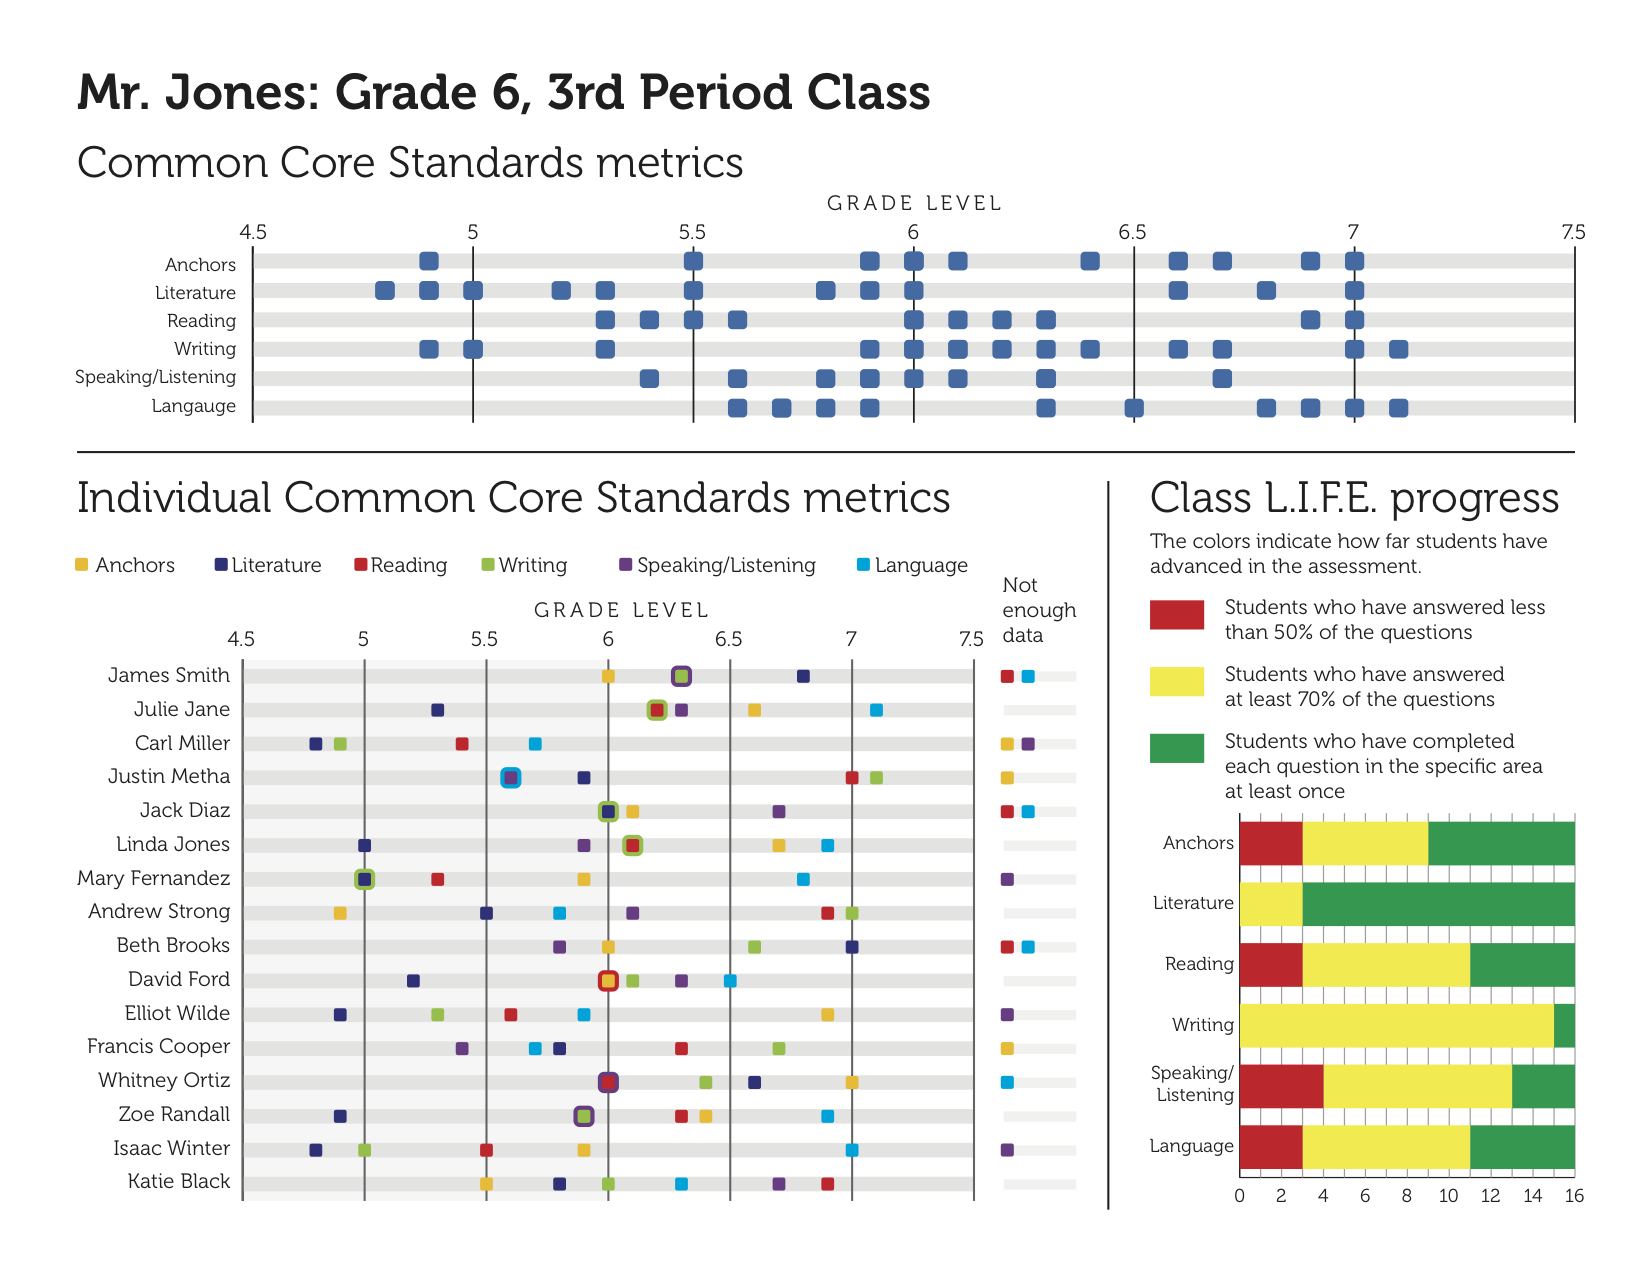 Gates Foundation Learning App Data Visualization